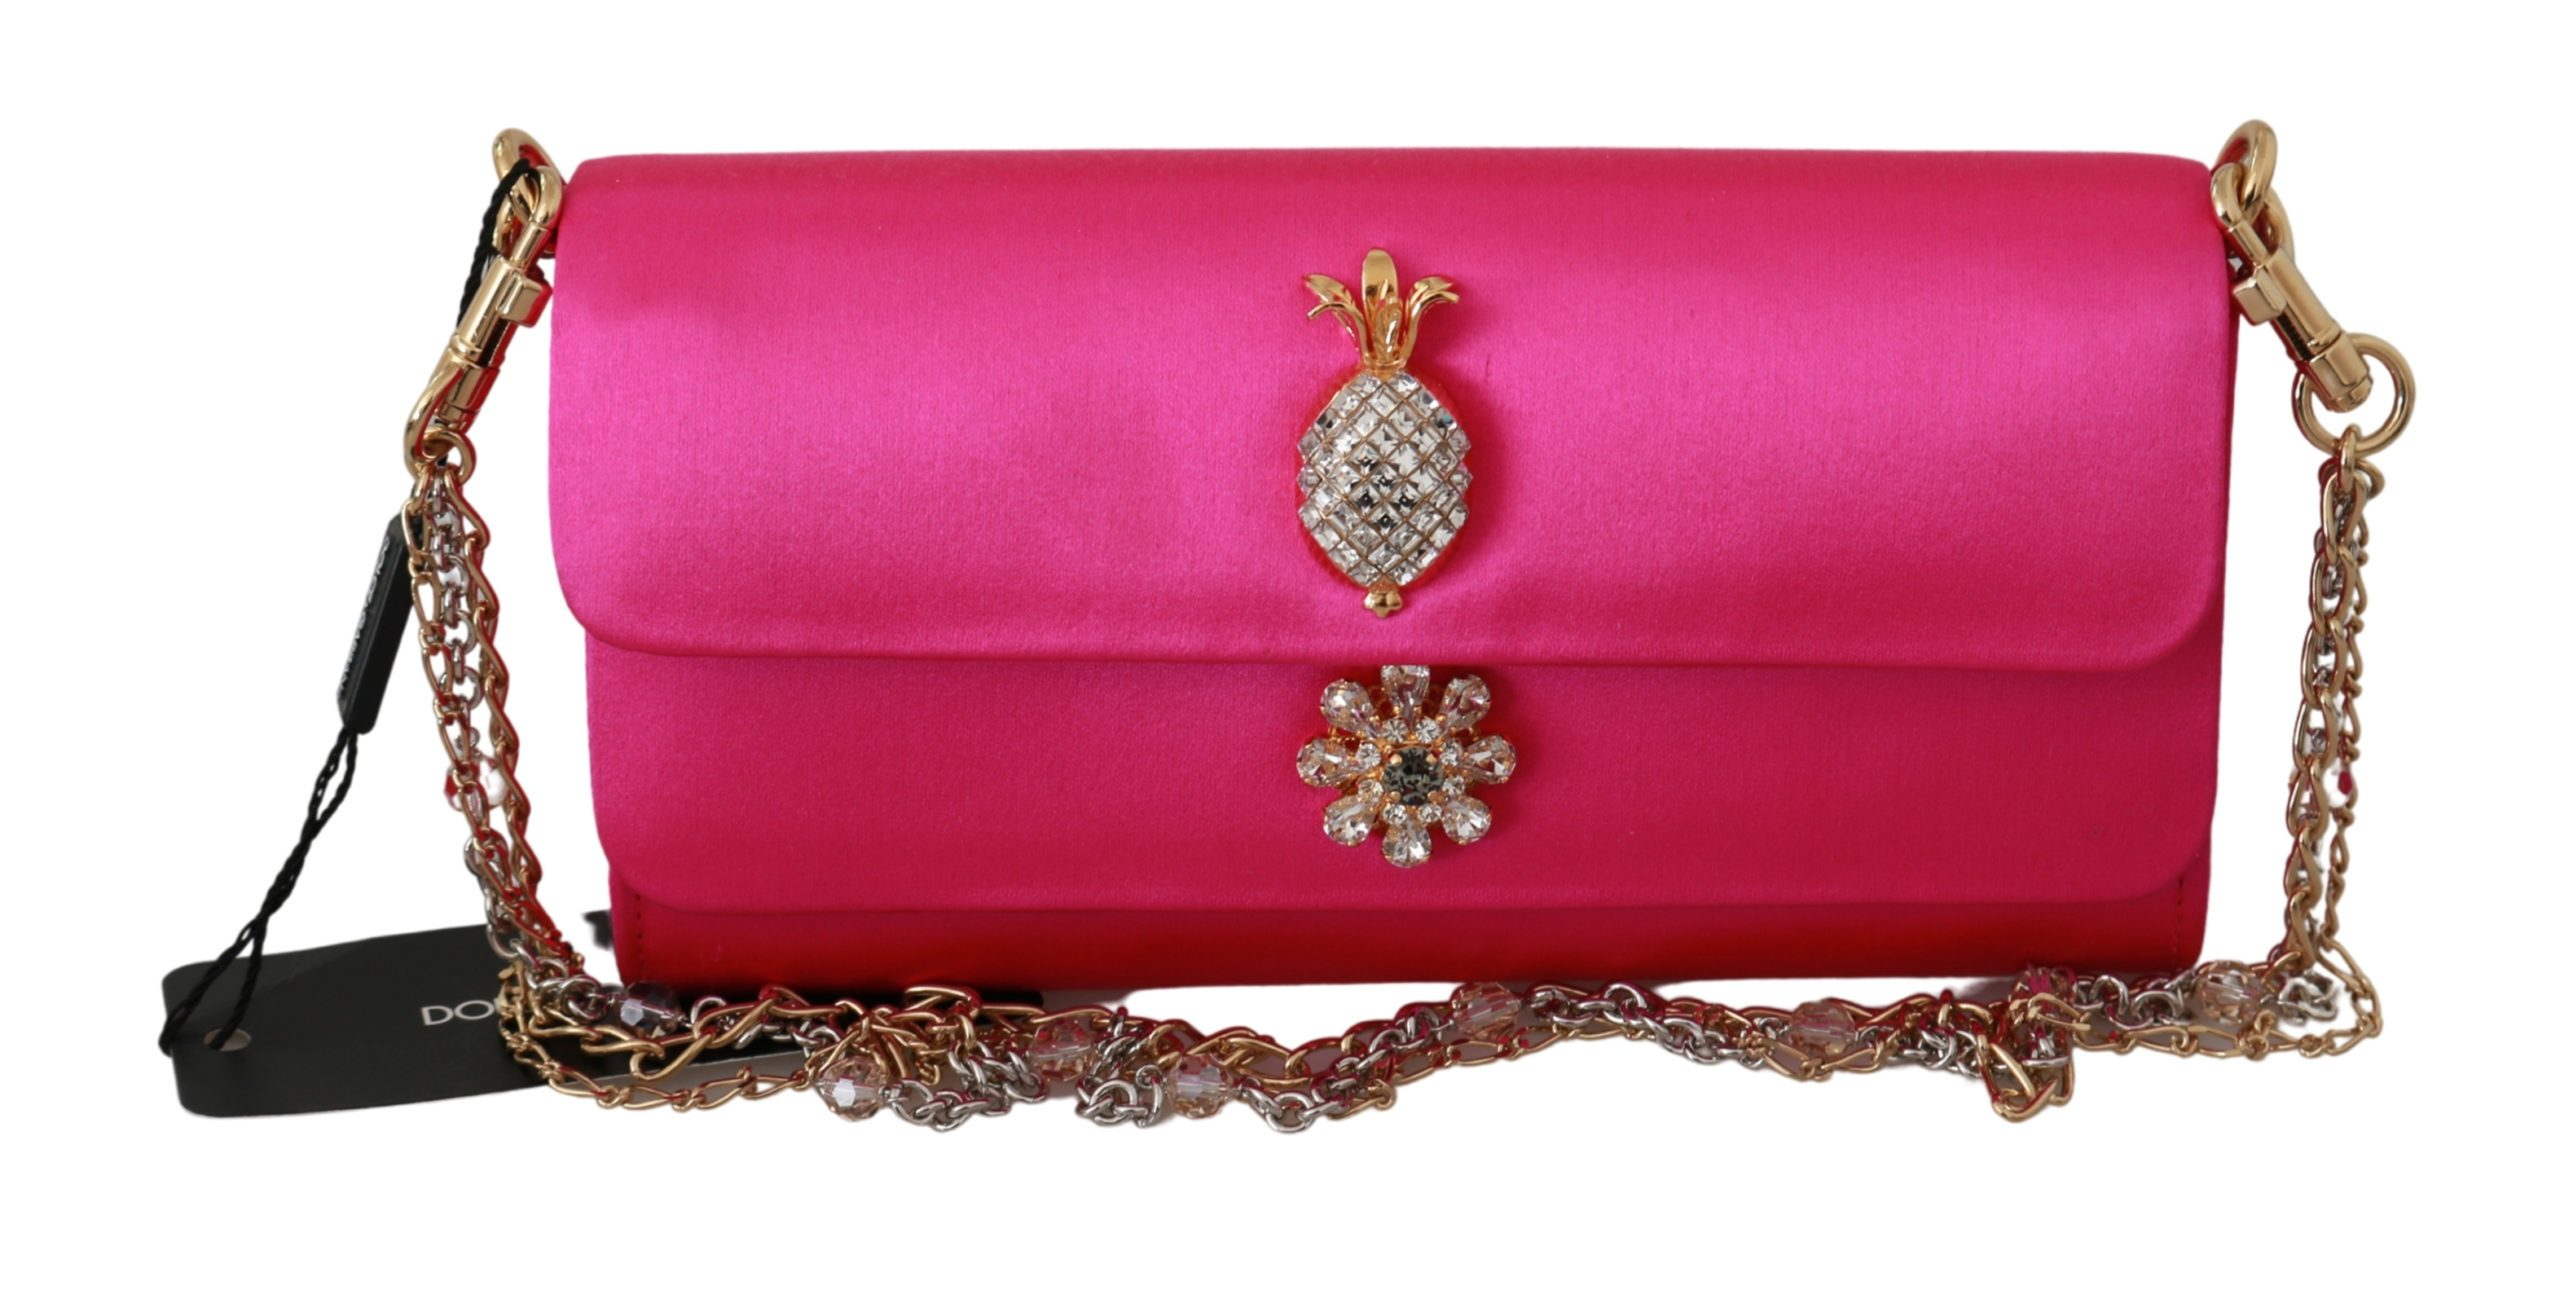 Dolce & Gabbana Women's Crystal Studs Evening Long Sling Crossbody Bag Pink VAS9199